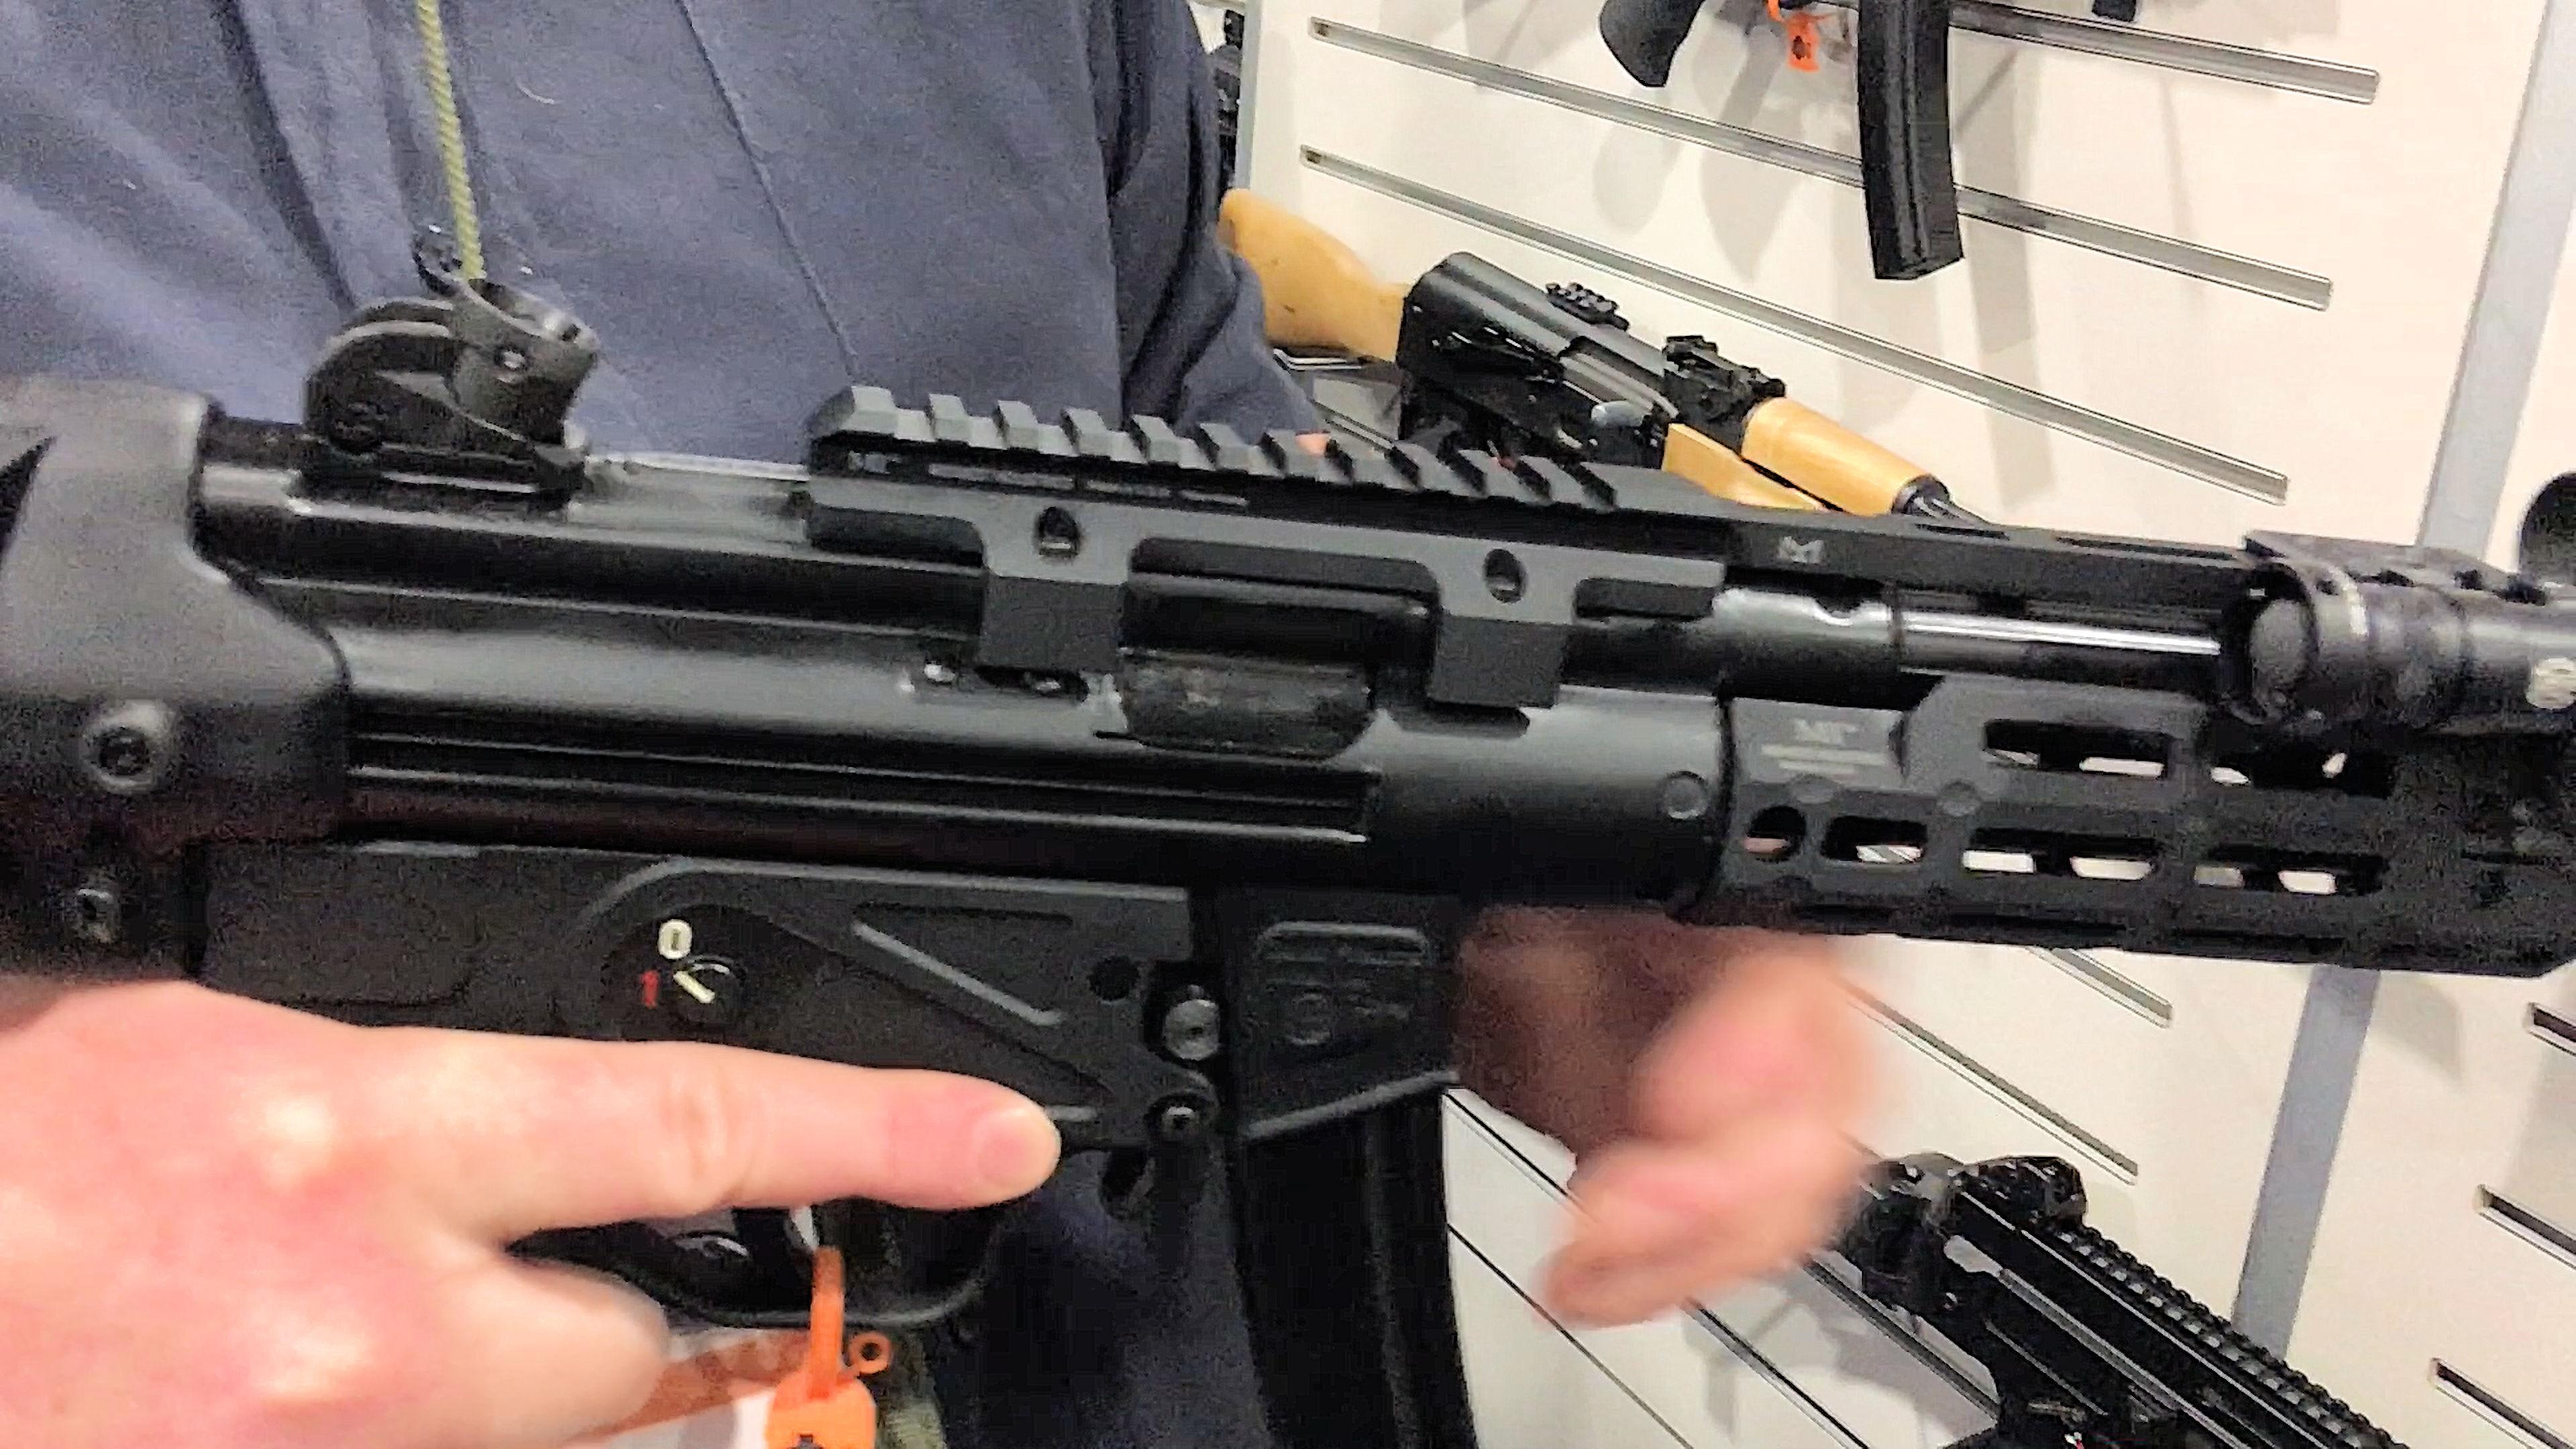 Midwest Industries MI M-LOK Tactical Handguards/Forend Rail